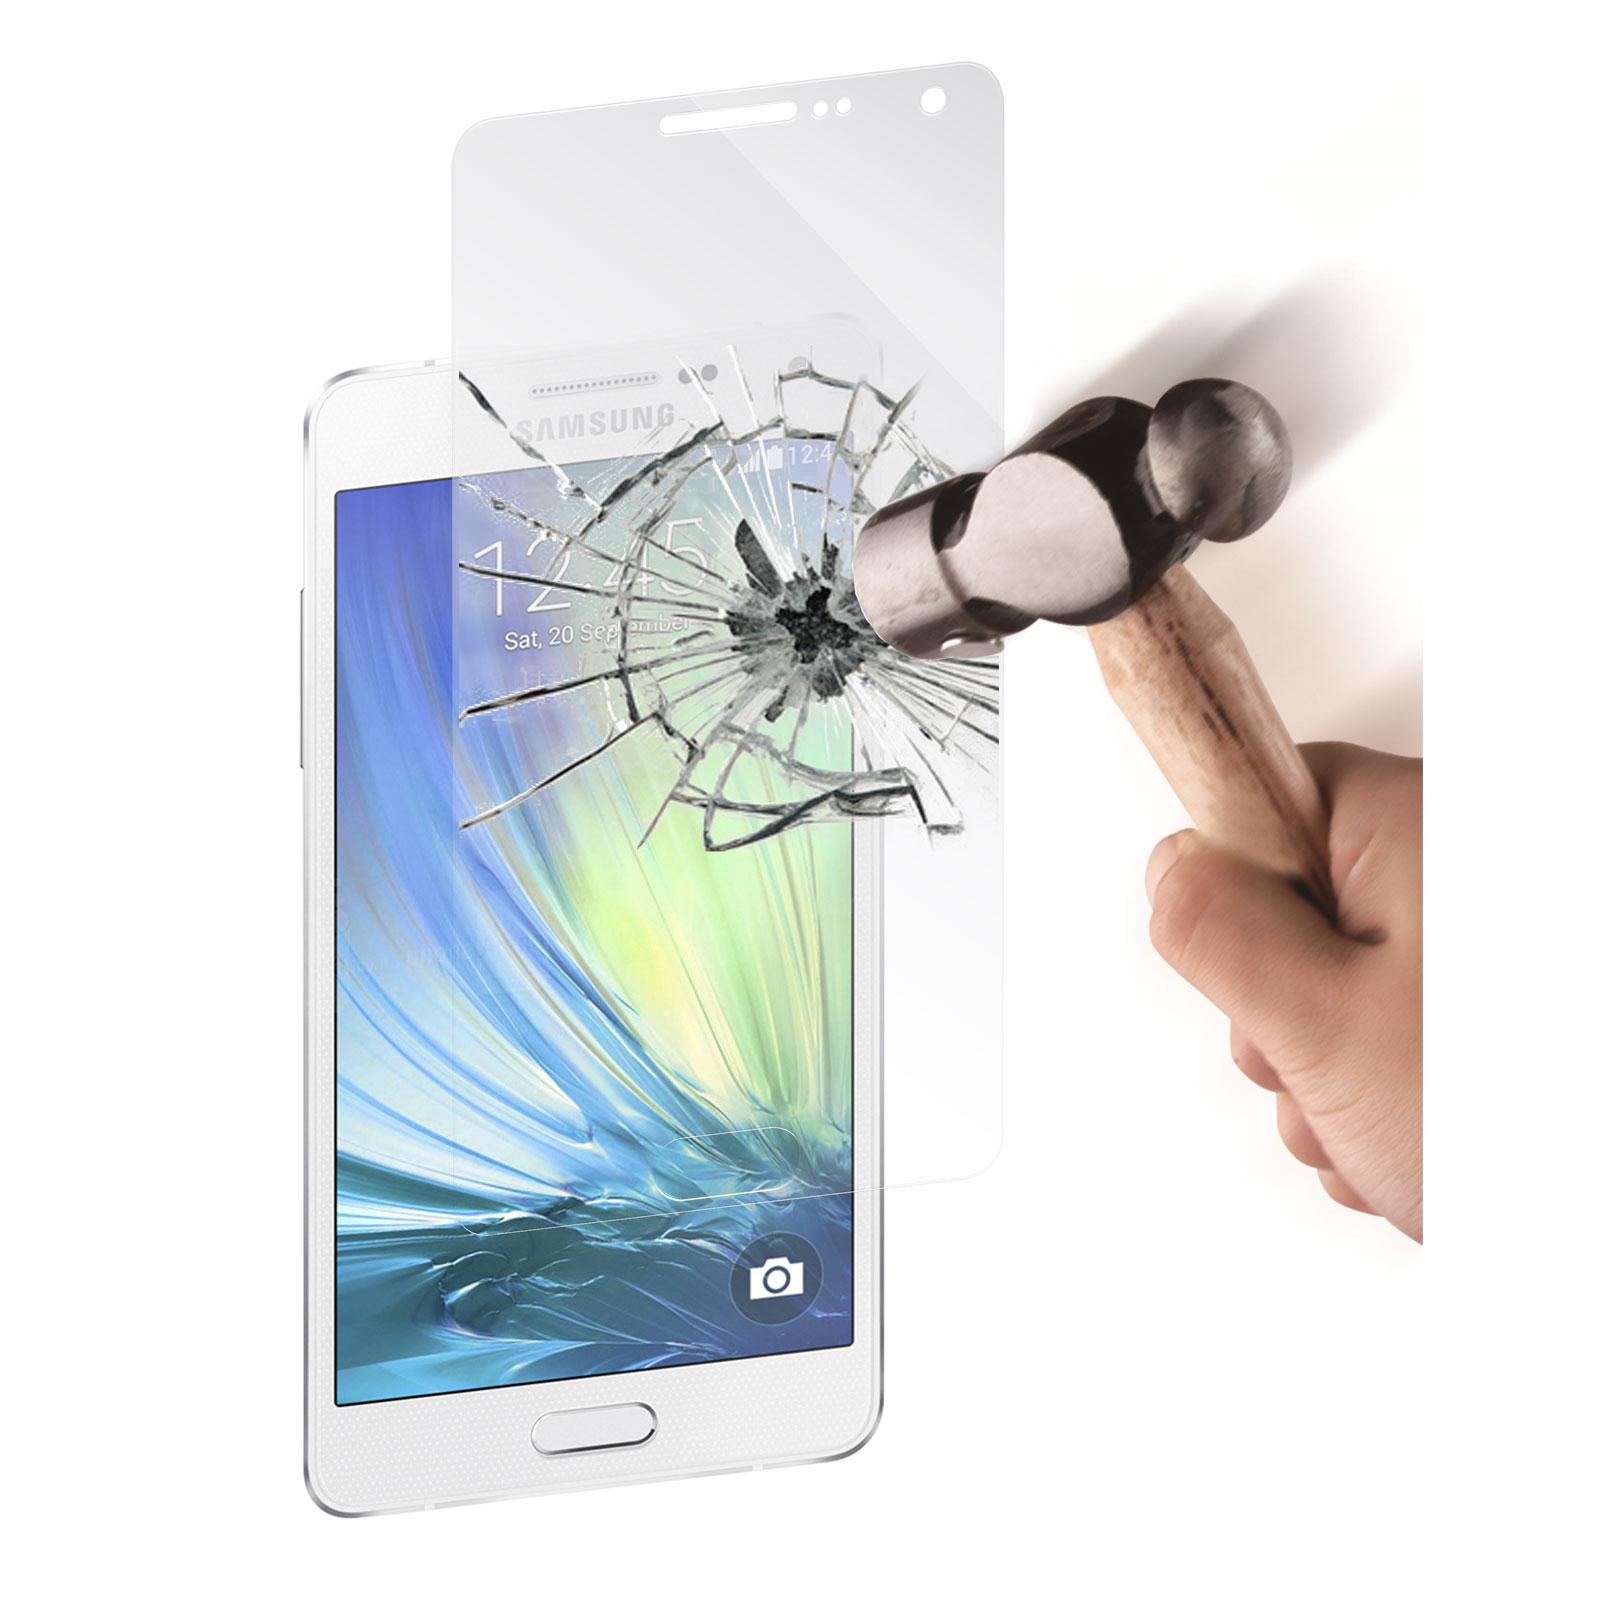 swiss charger verre tremp pour samsung galaxy a5 film protecteur t l phone swiss charger sur. Black Bedroom Furniture Sets. Home Design Ideas